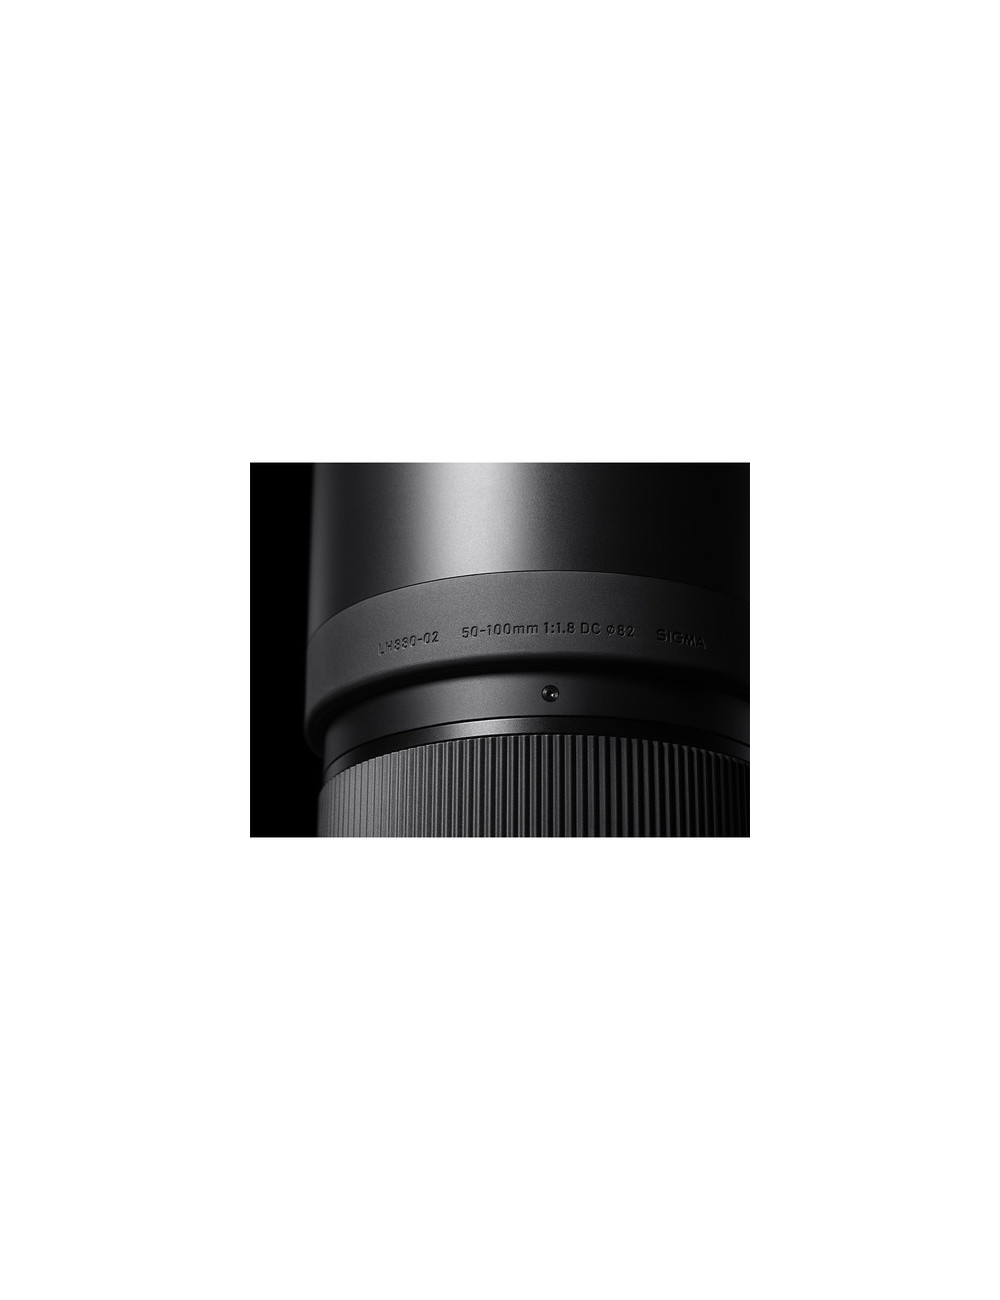 Lumix DMC-G9 Cámara DIgital de Gama Alta, video 4K, Foto 6K y hasta 80 mp en foto fija